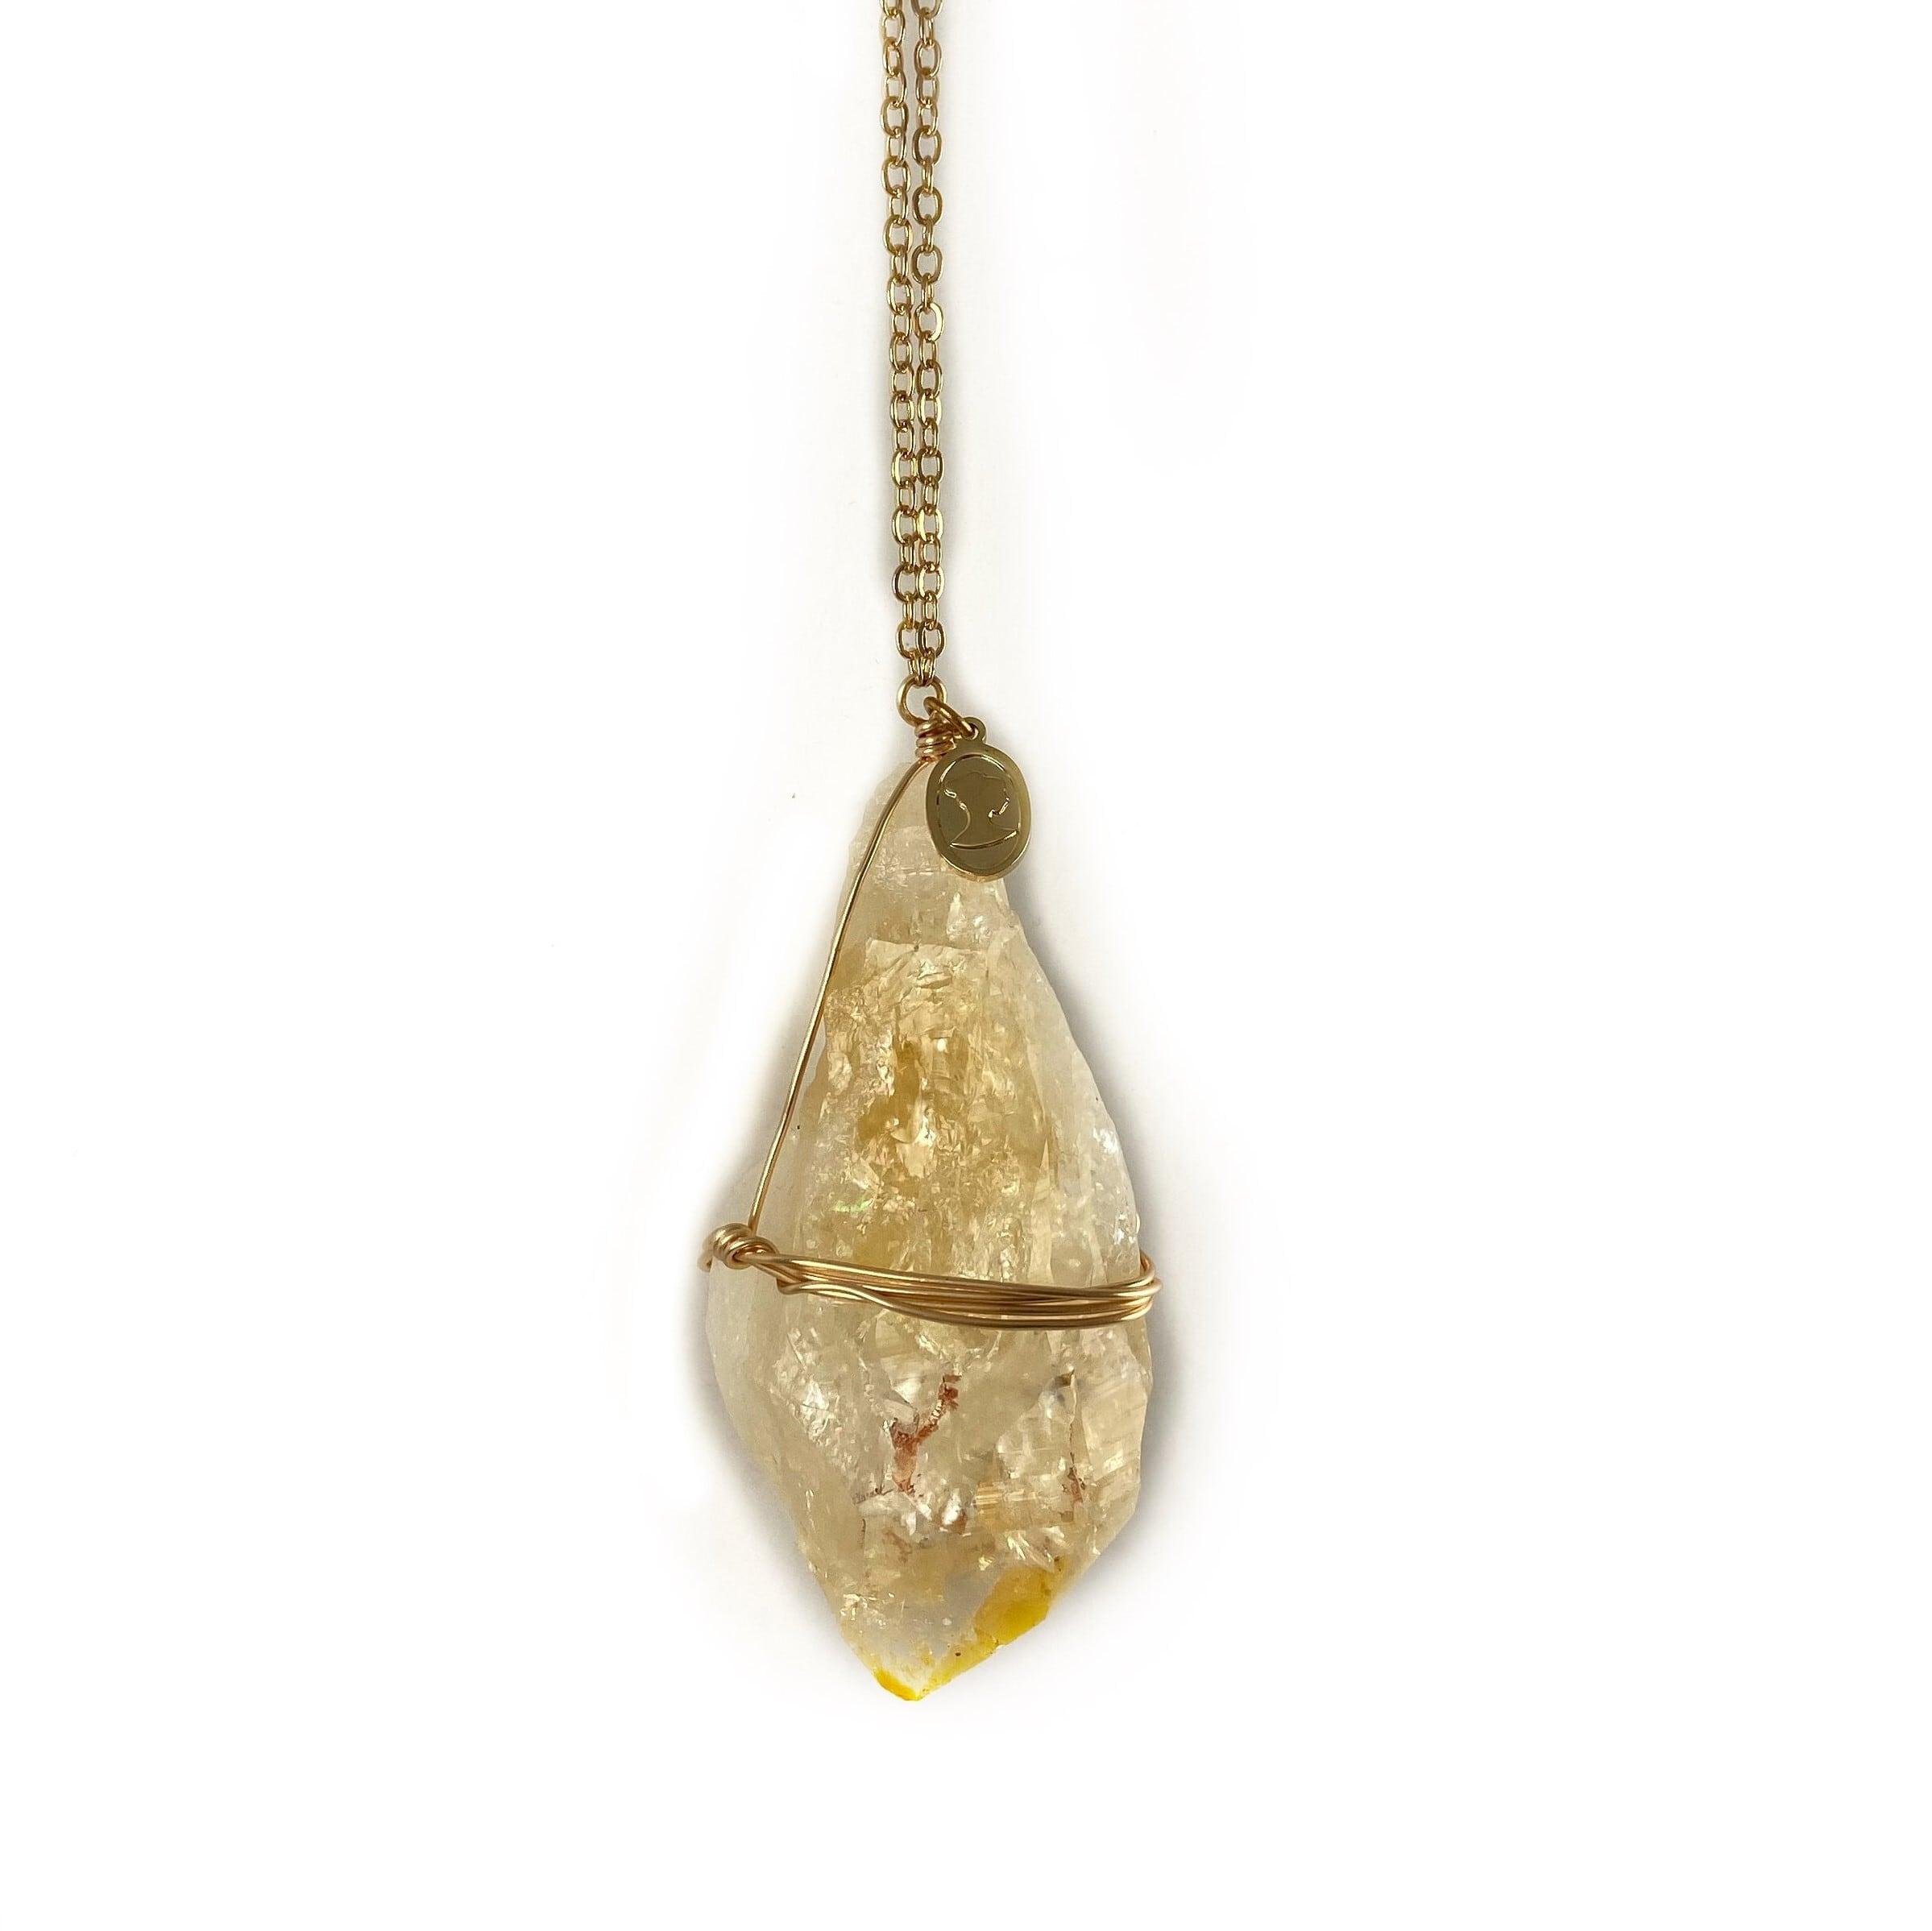 Ariana Ost Healing Crystal Citrine Ornament オーナメント シトリン